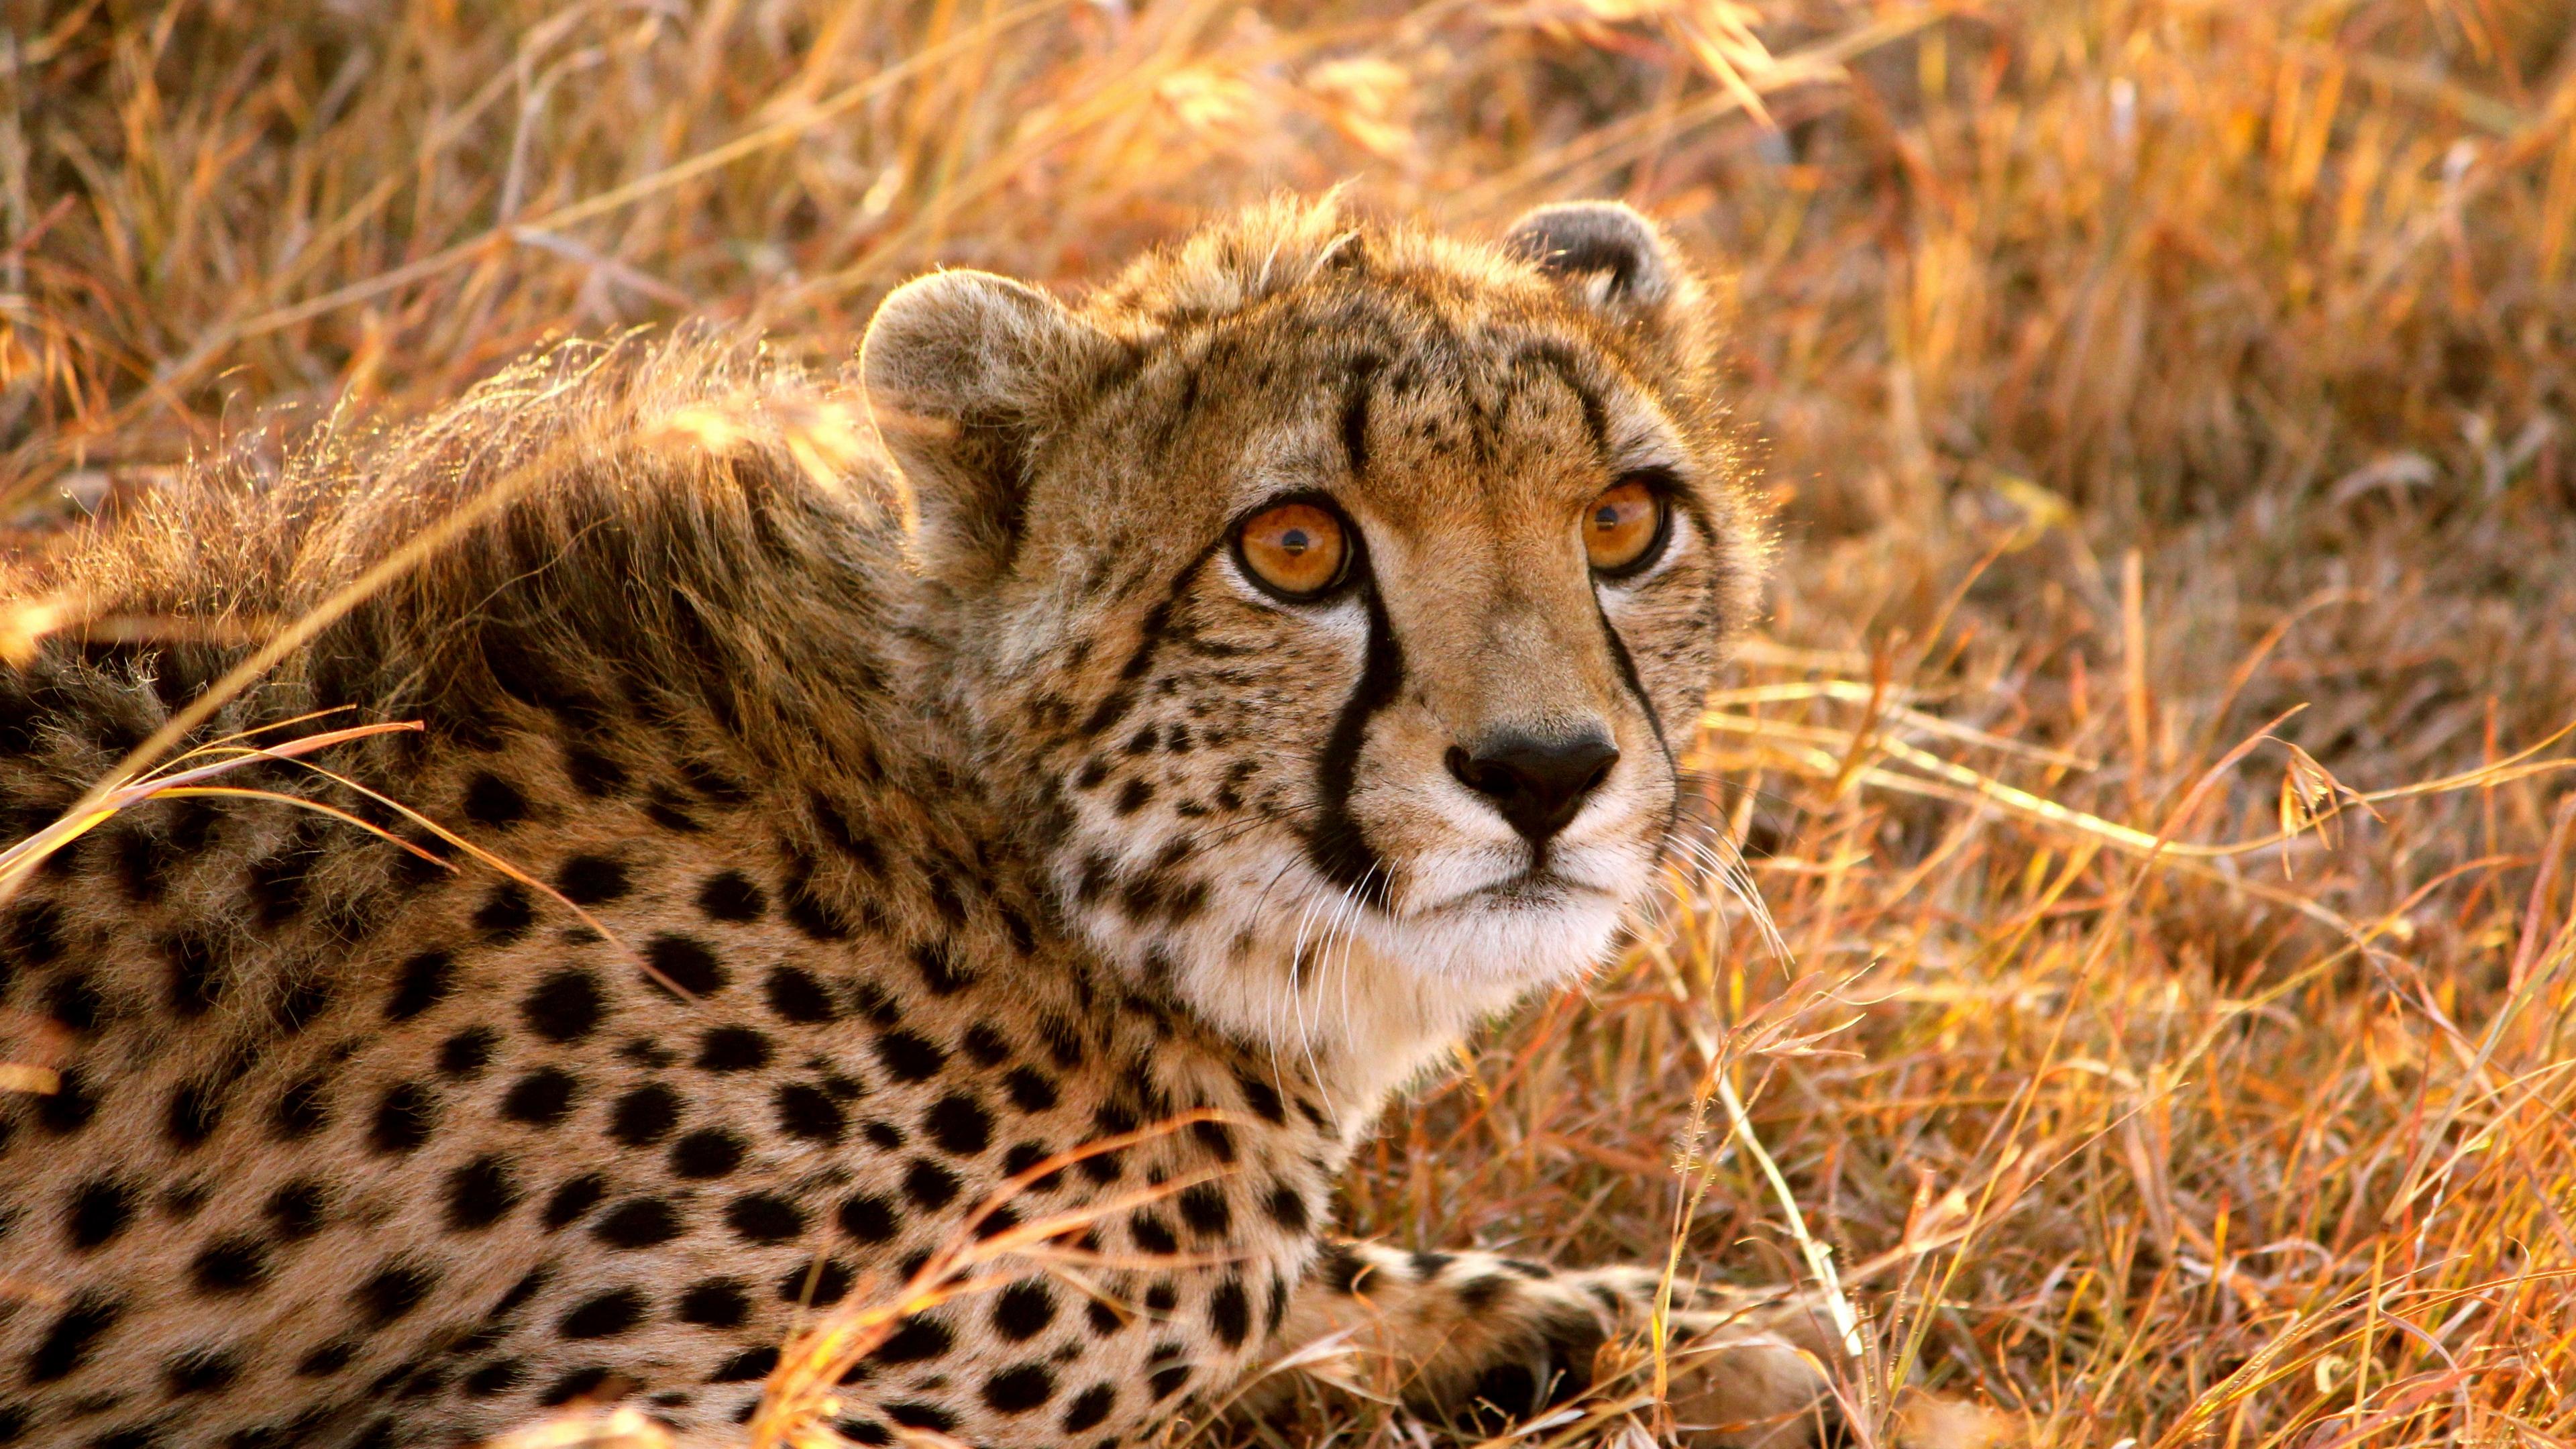 cheetah big cat fright lie 4k 1542242544 - cheetah, big cat, fright, lie 4k - fright, Cheetah, big cat